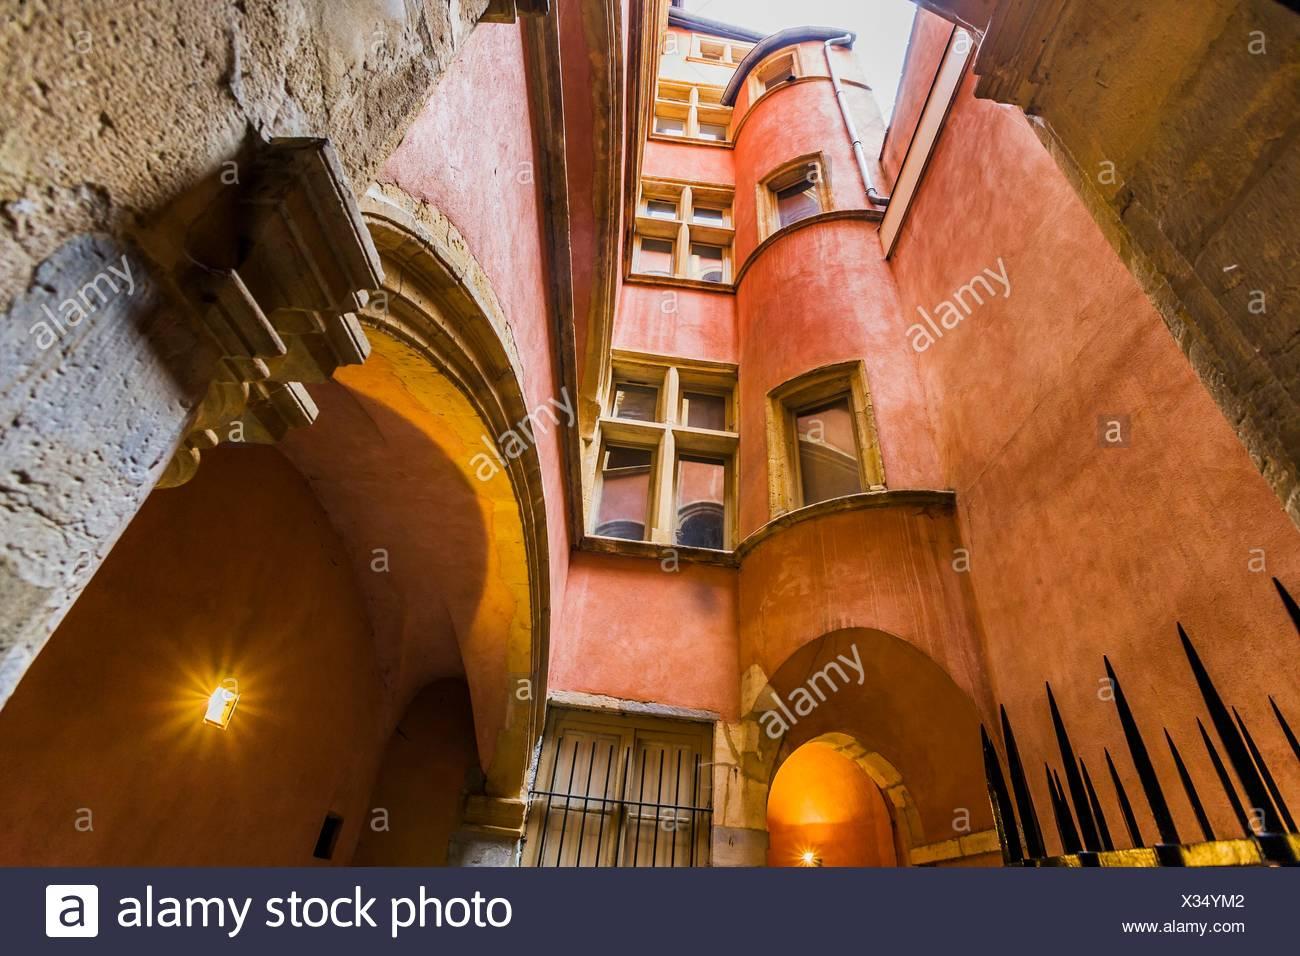 France, Rhone-Alpes, Lyon. Vieux Lyon. Renaissance court in one of the 'traboules''' - Stock Image